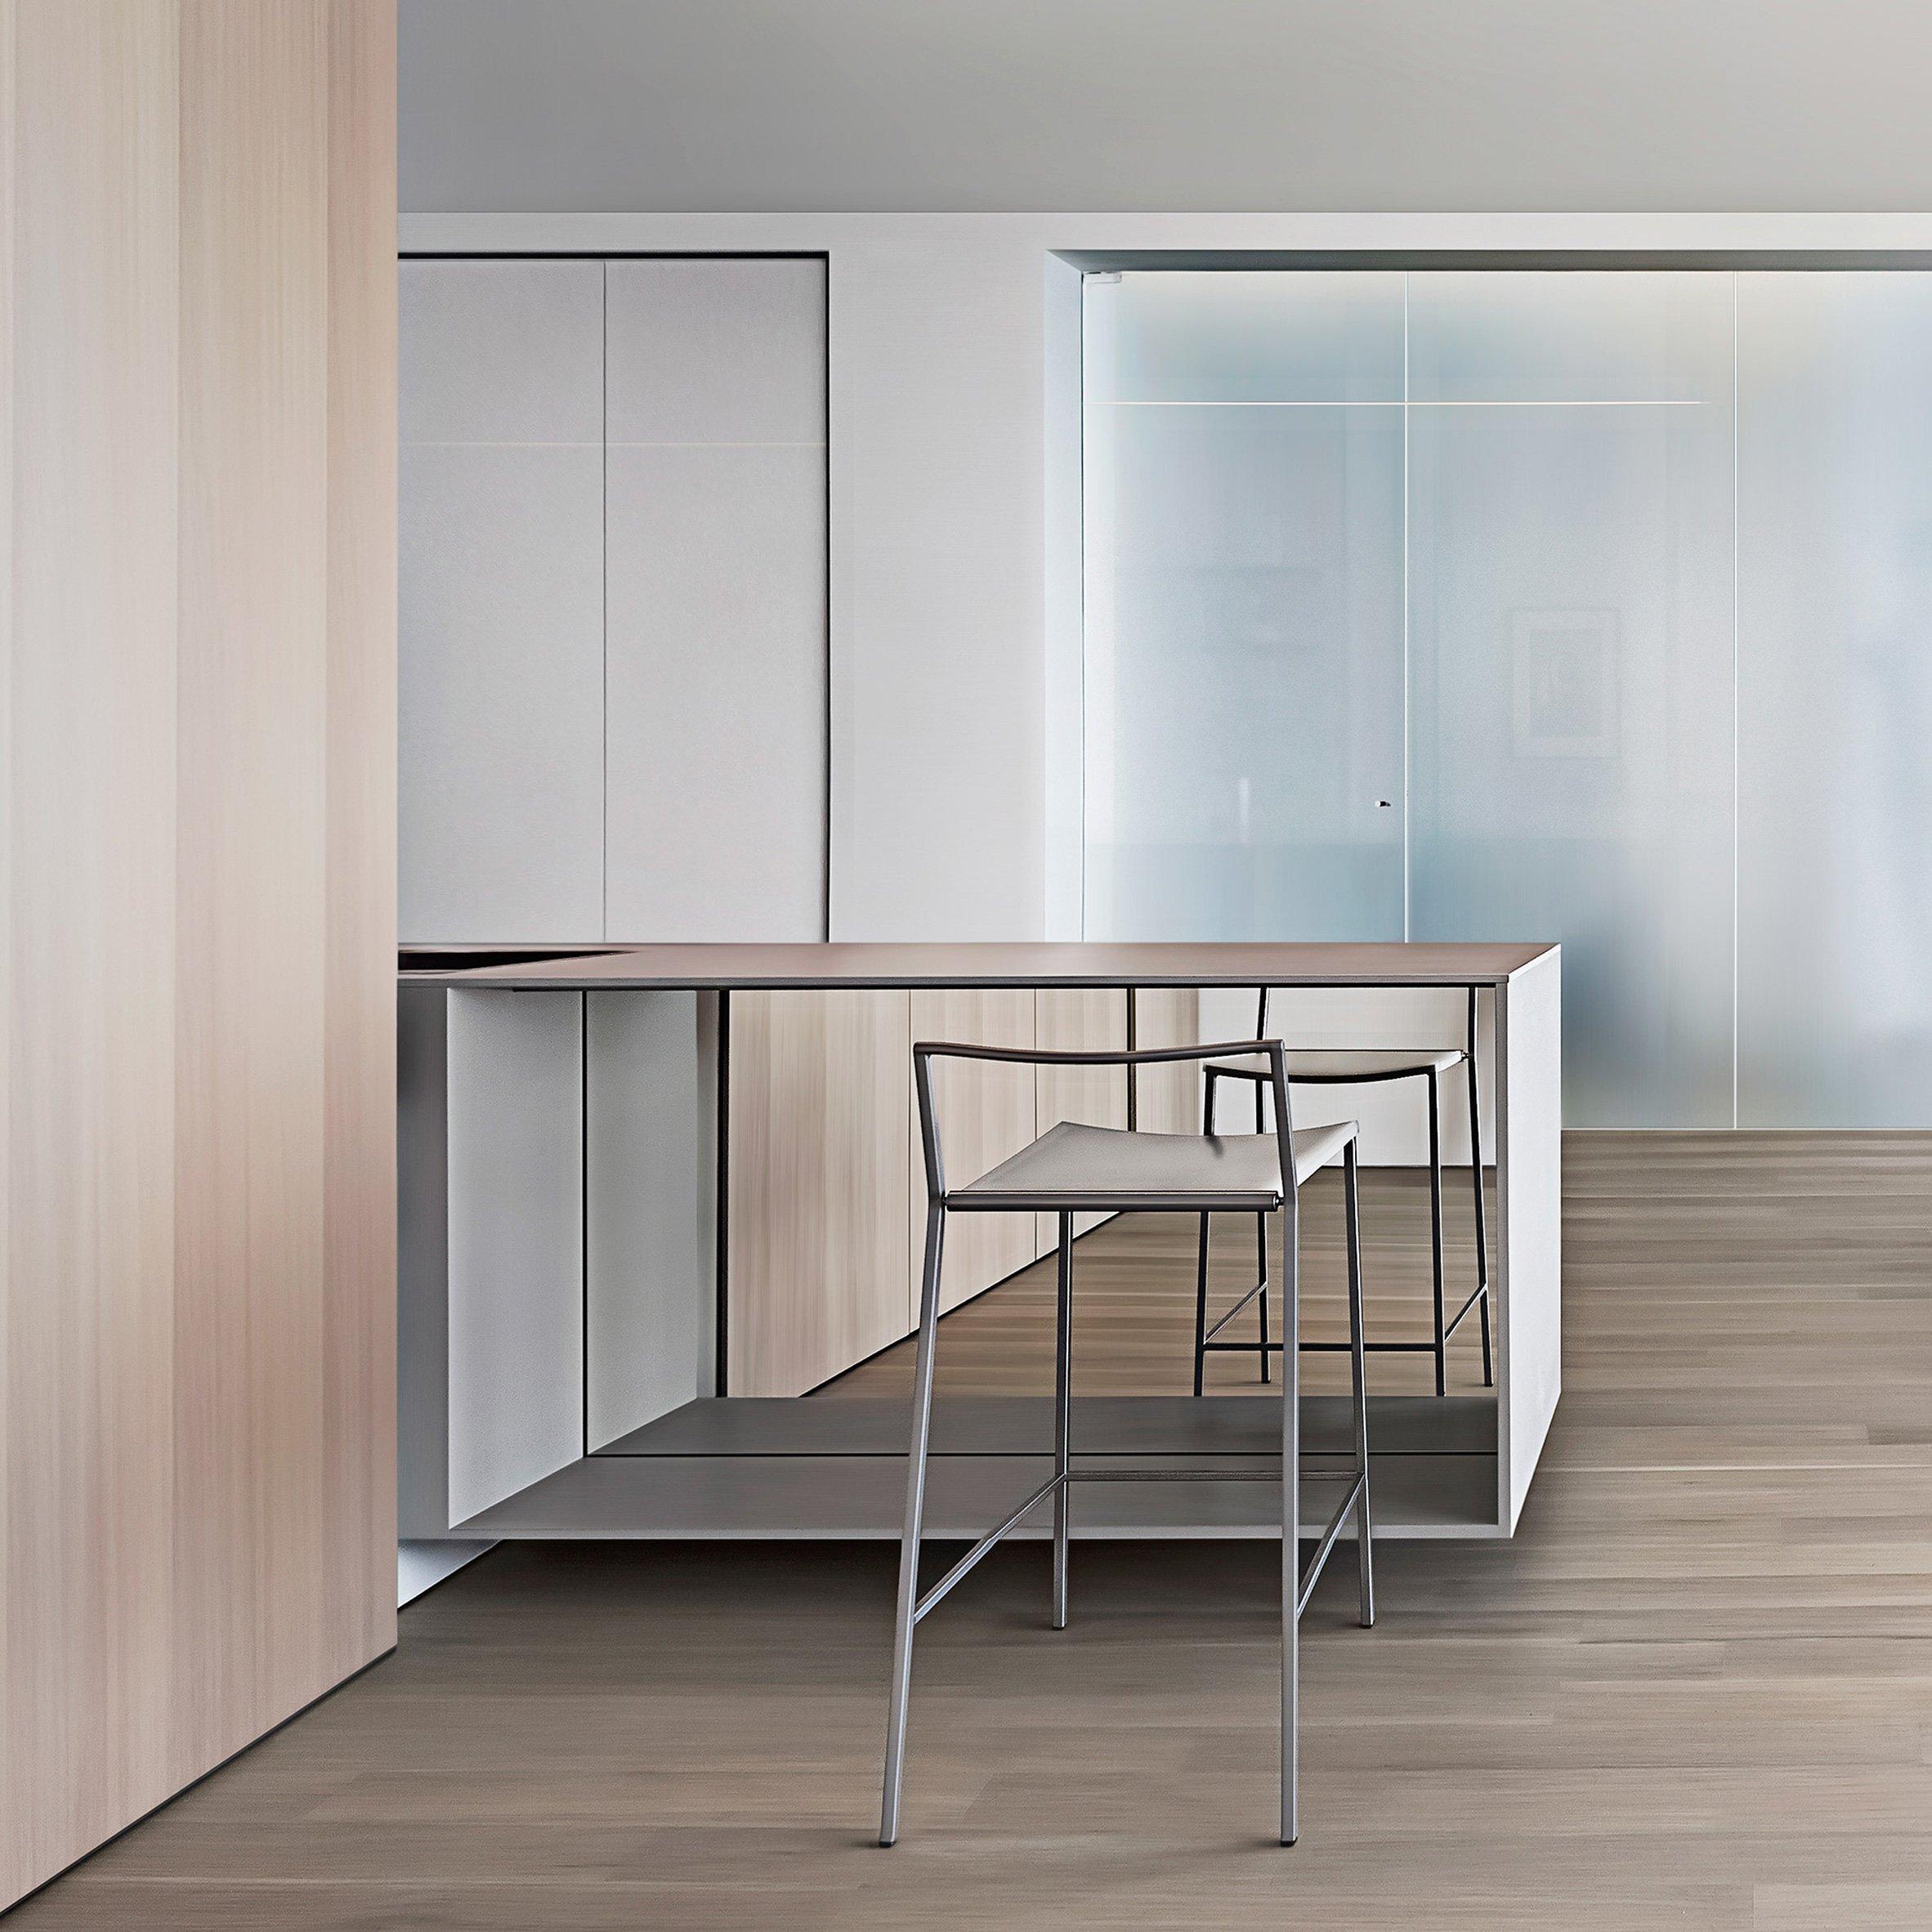 Vladimir Radutny honours Mies' minimalism at renovated Lake Shore Drive apartment 61